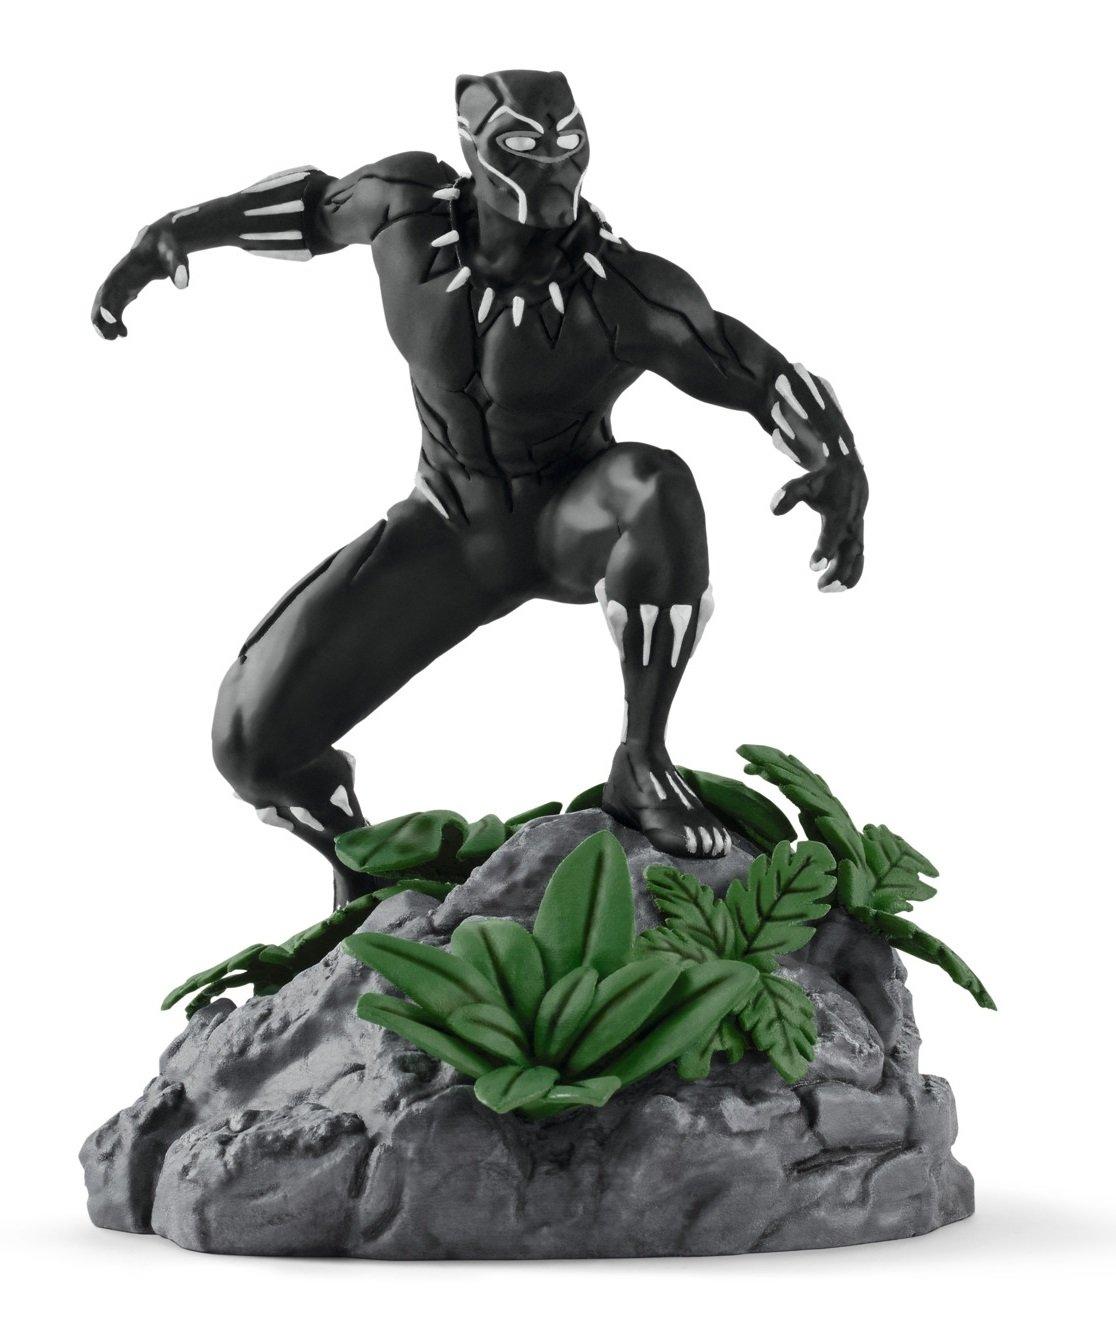 Black Panther Figurine Marvel Comics Statue Avengers Peinte Mains Schleich 21513